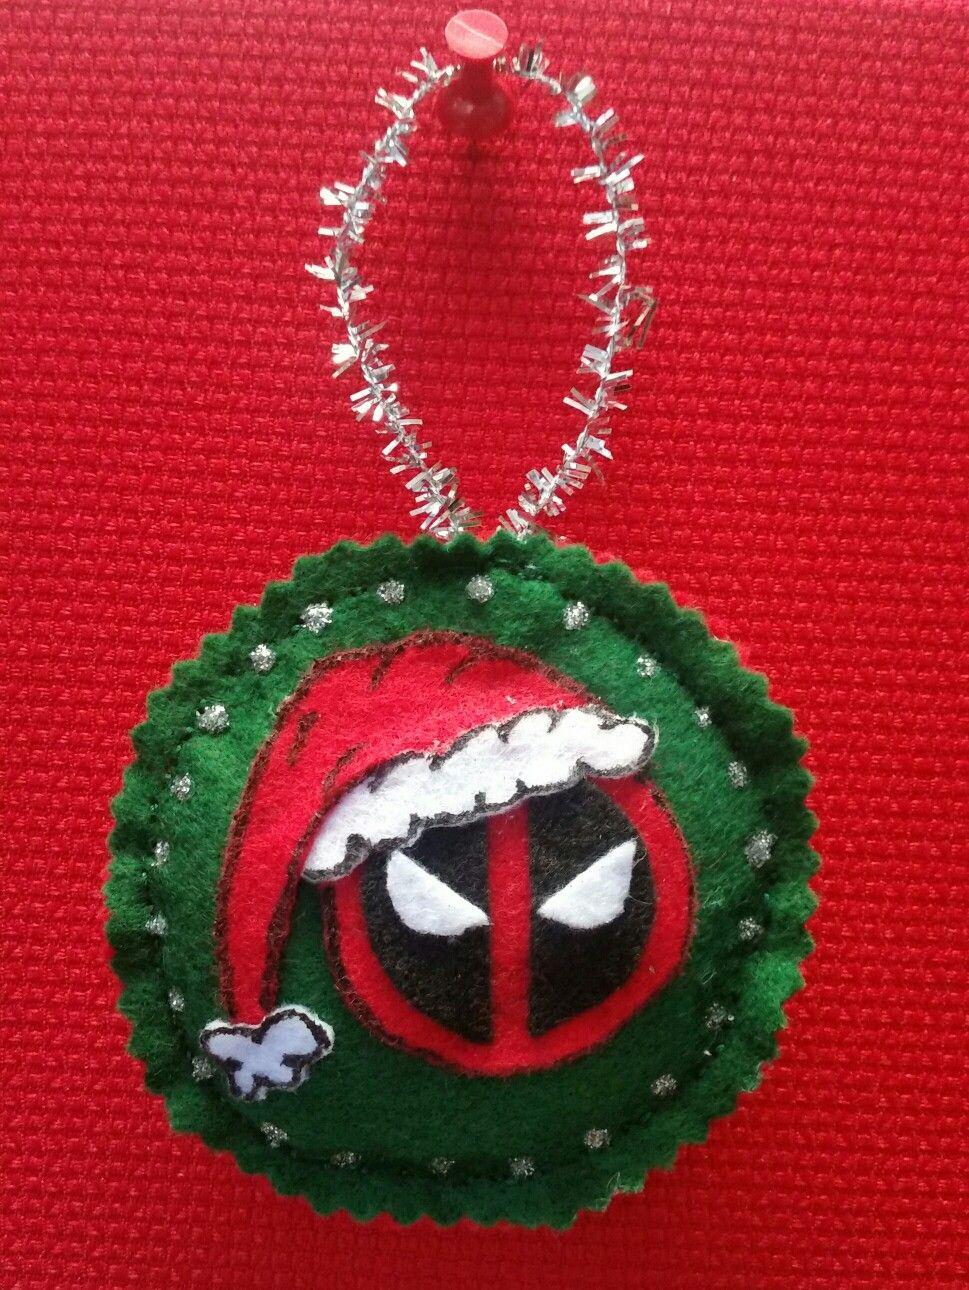 Deadpool Christmas ornament | Deadpool | Pinterest